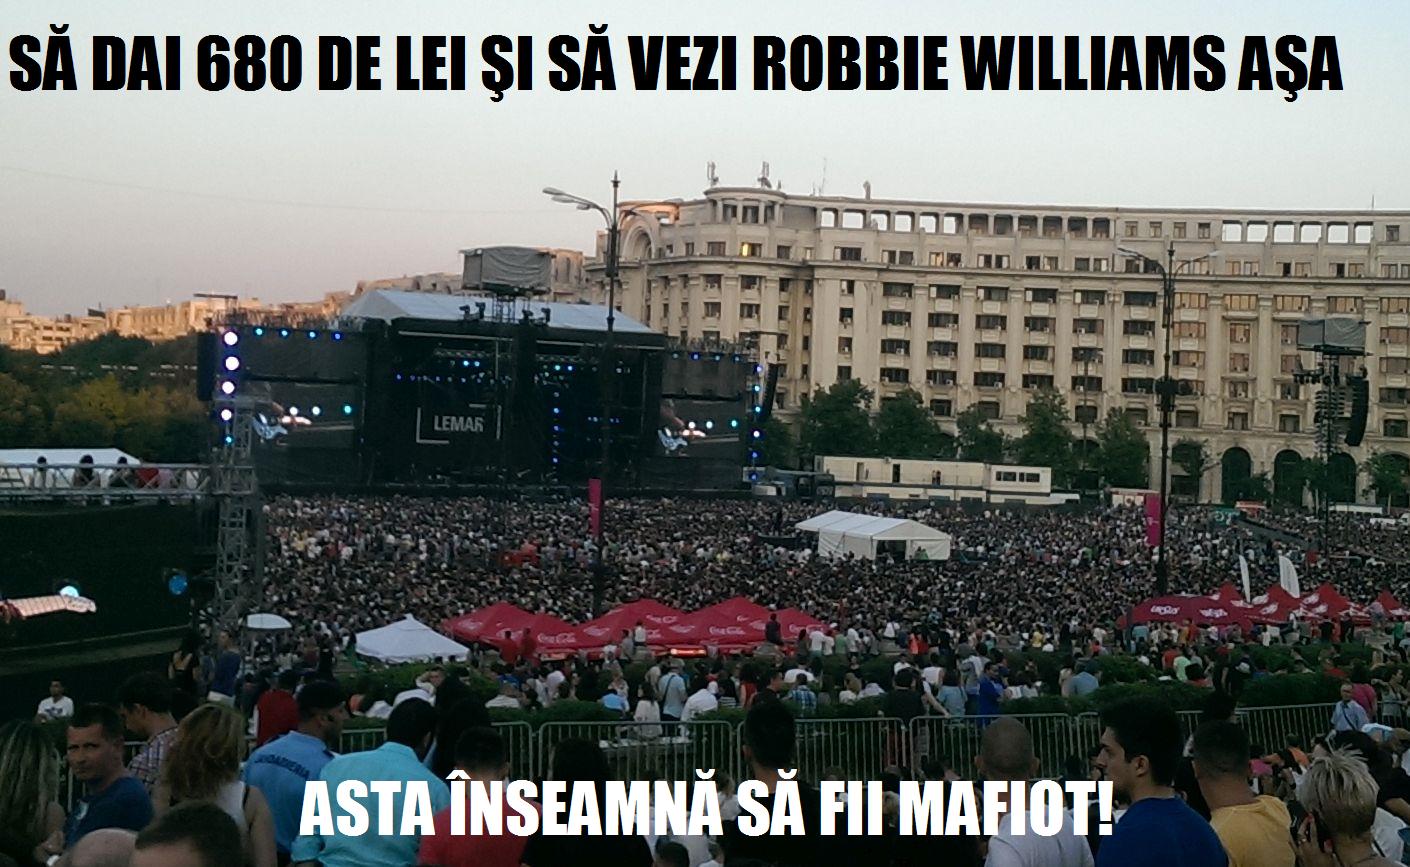 mafiot_robbie